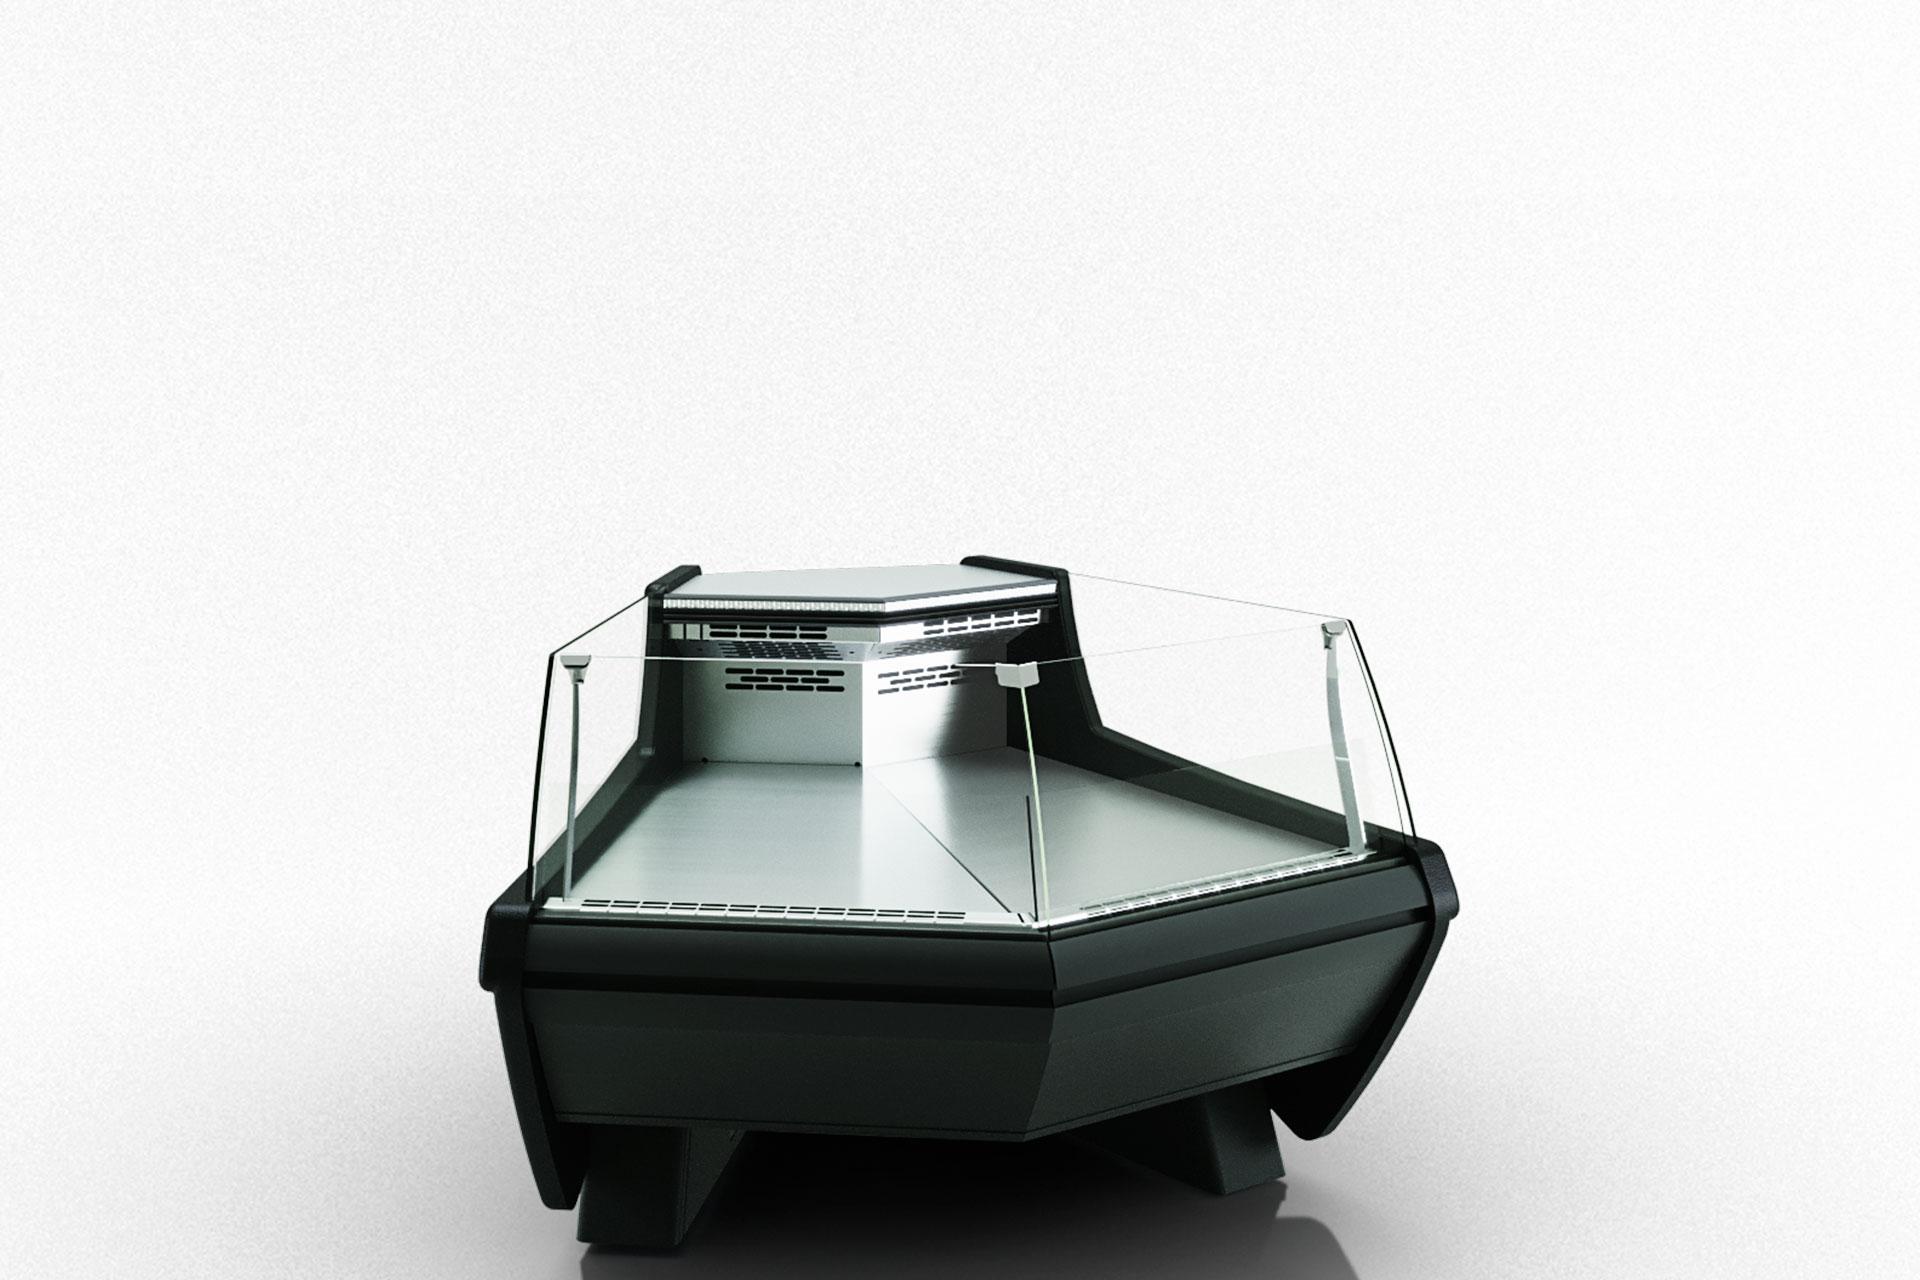 Kühlvitrinen Symphony luxe MG 100 deli self 085-DLM-ES45